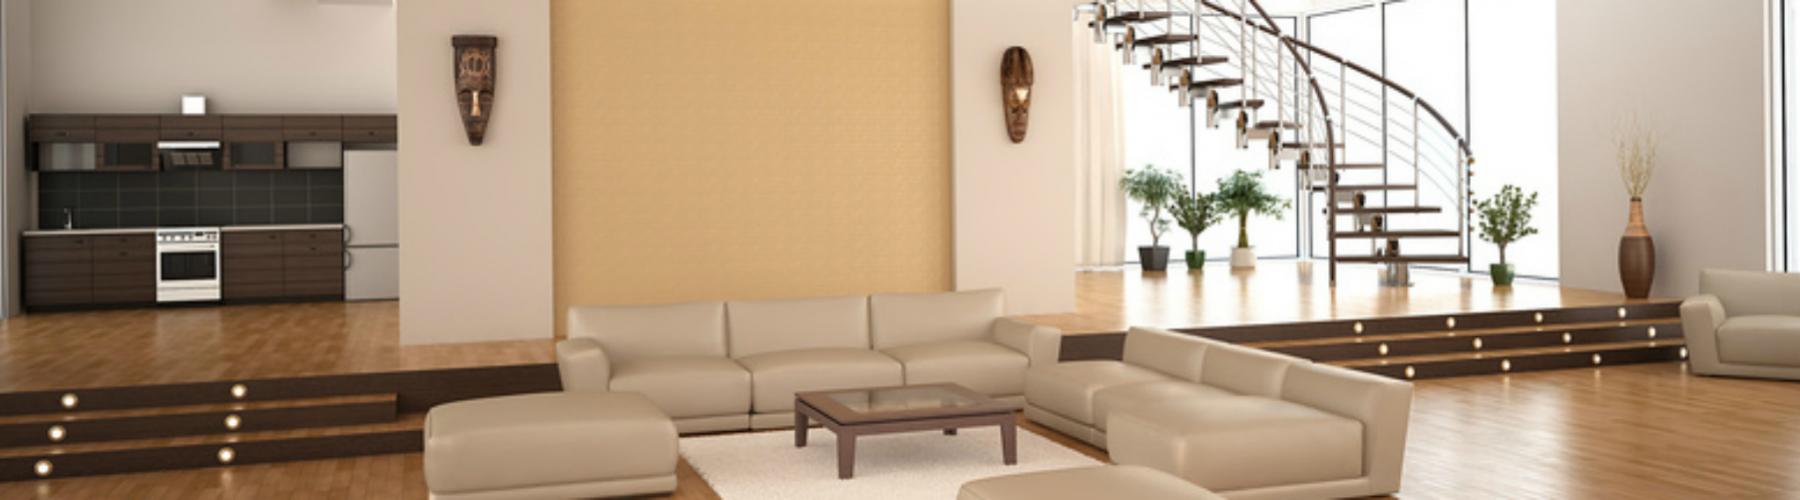 electricit g n rale votre installation suivant vos attentes. Black Bedroom Furniture Sets. Home Design Ideas